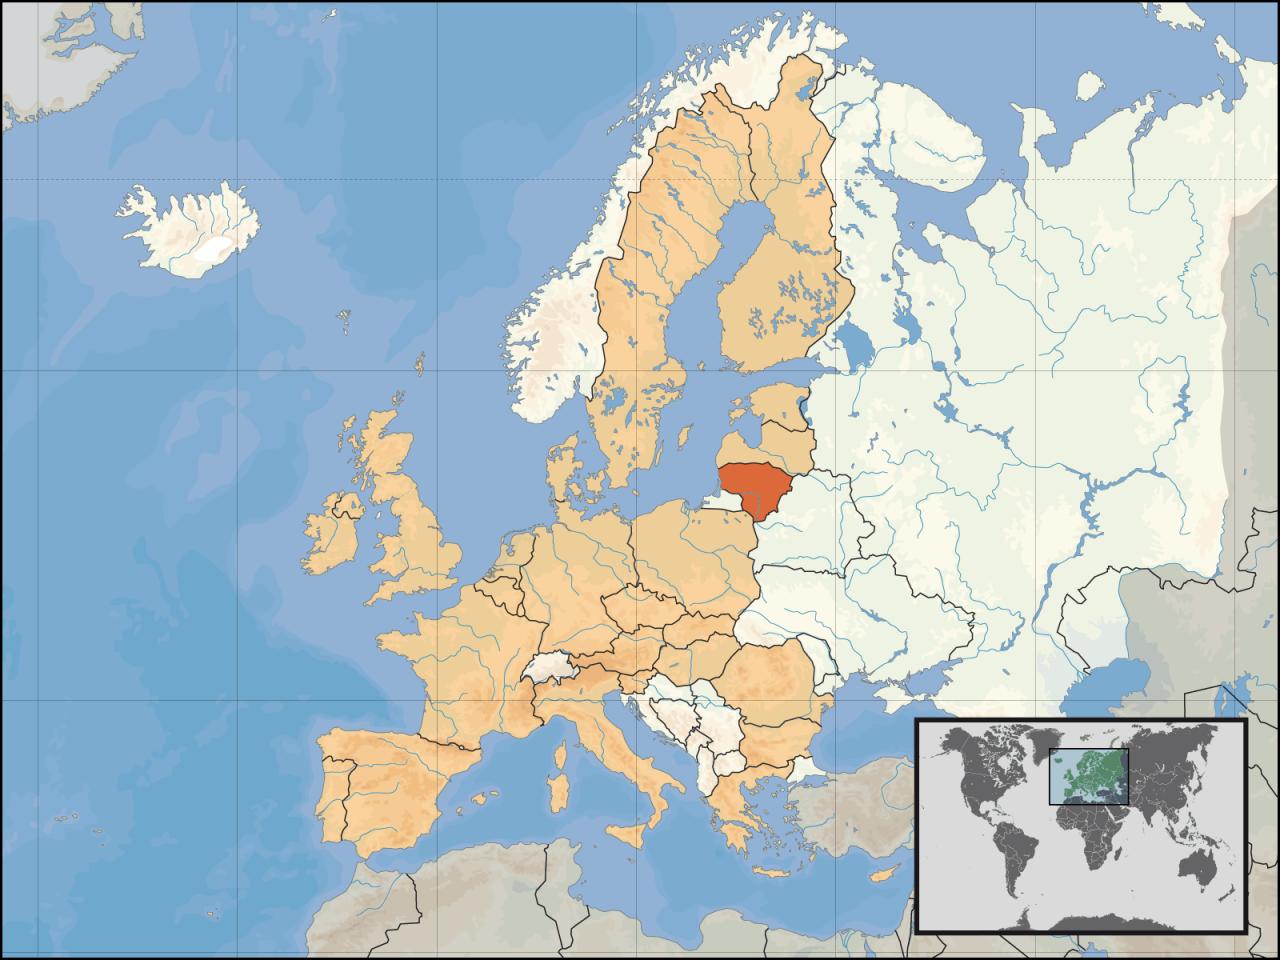 Lokalizacja Litwy na tle Europy